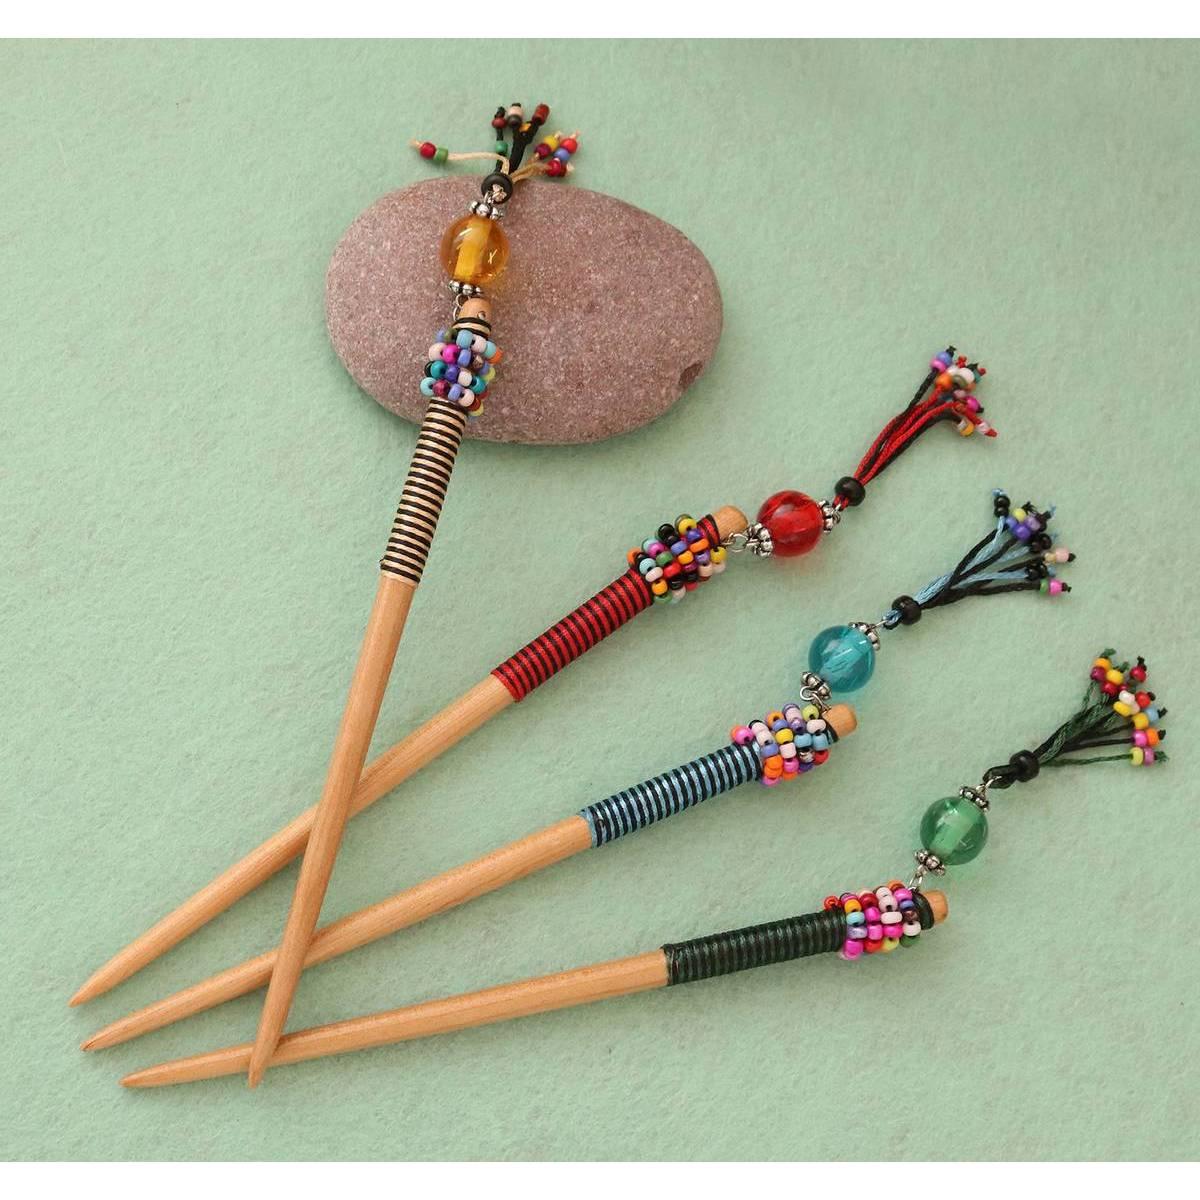 (Pack of 4) Fancy Durable Wooden Hair Jura Stick Hair Hodkin Kanzashi Binyeo Bun Stick Hair Stick For Girls, Women and Ladies